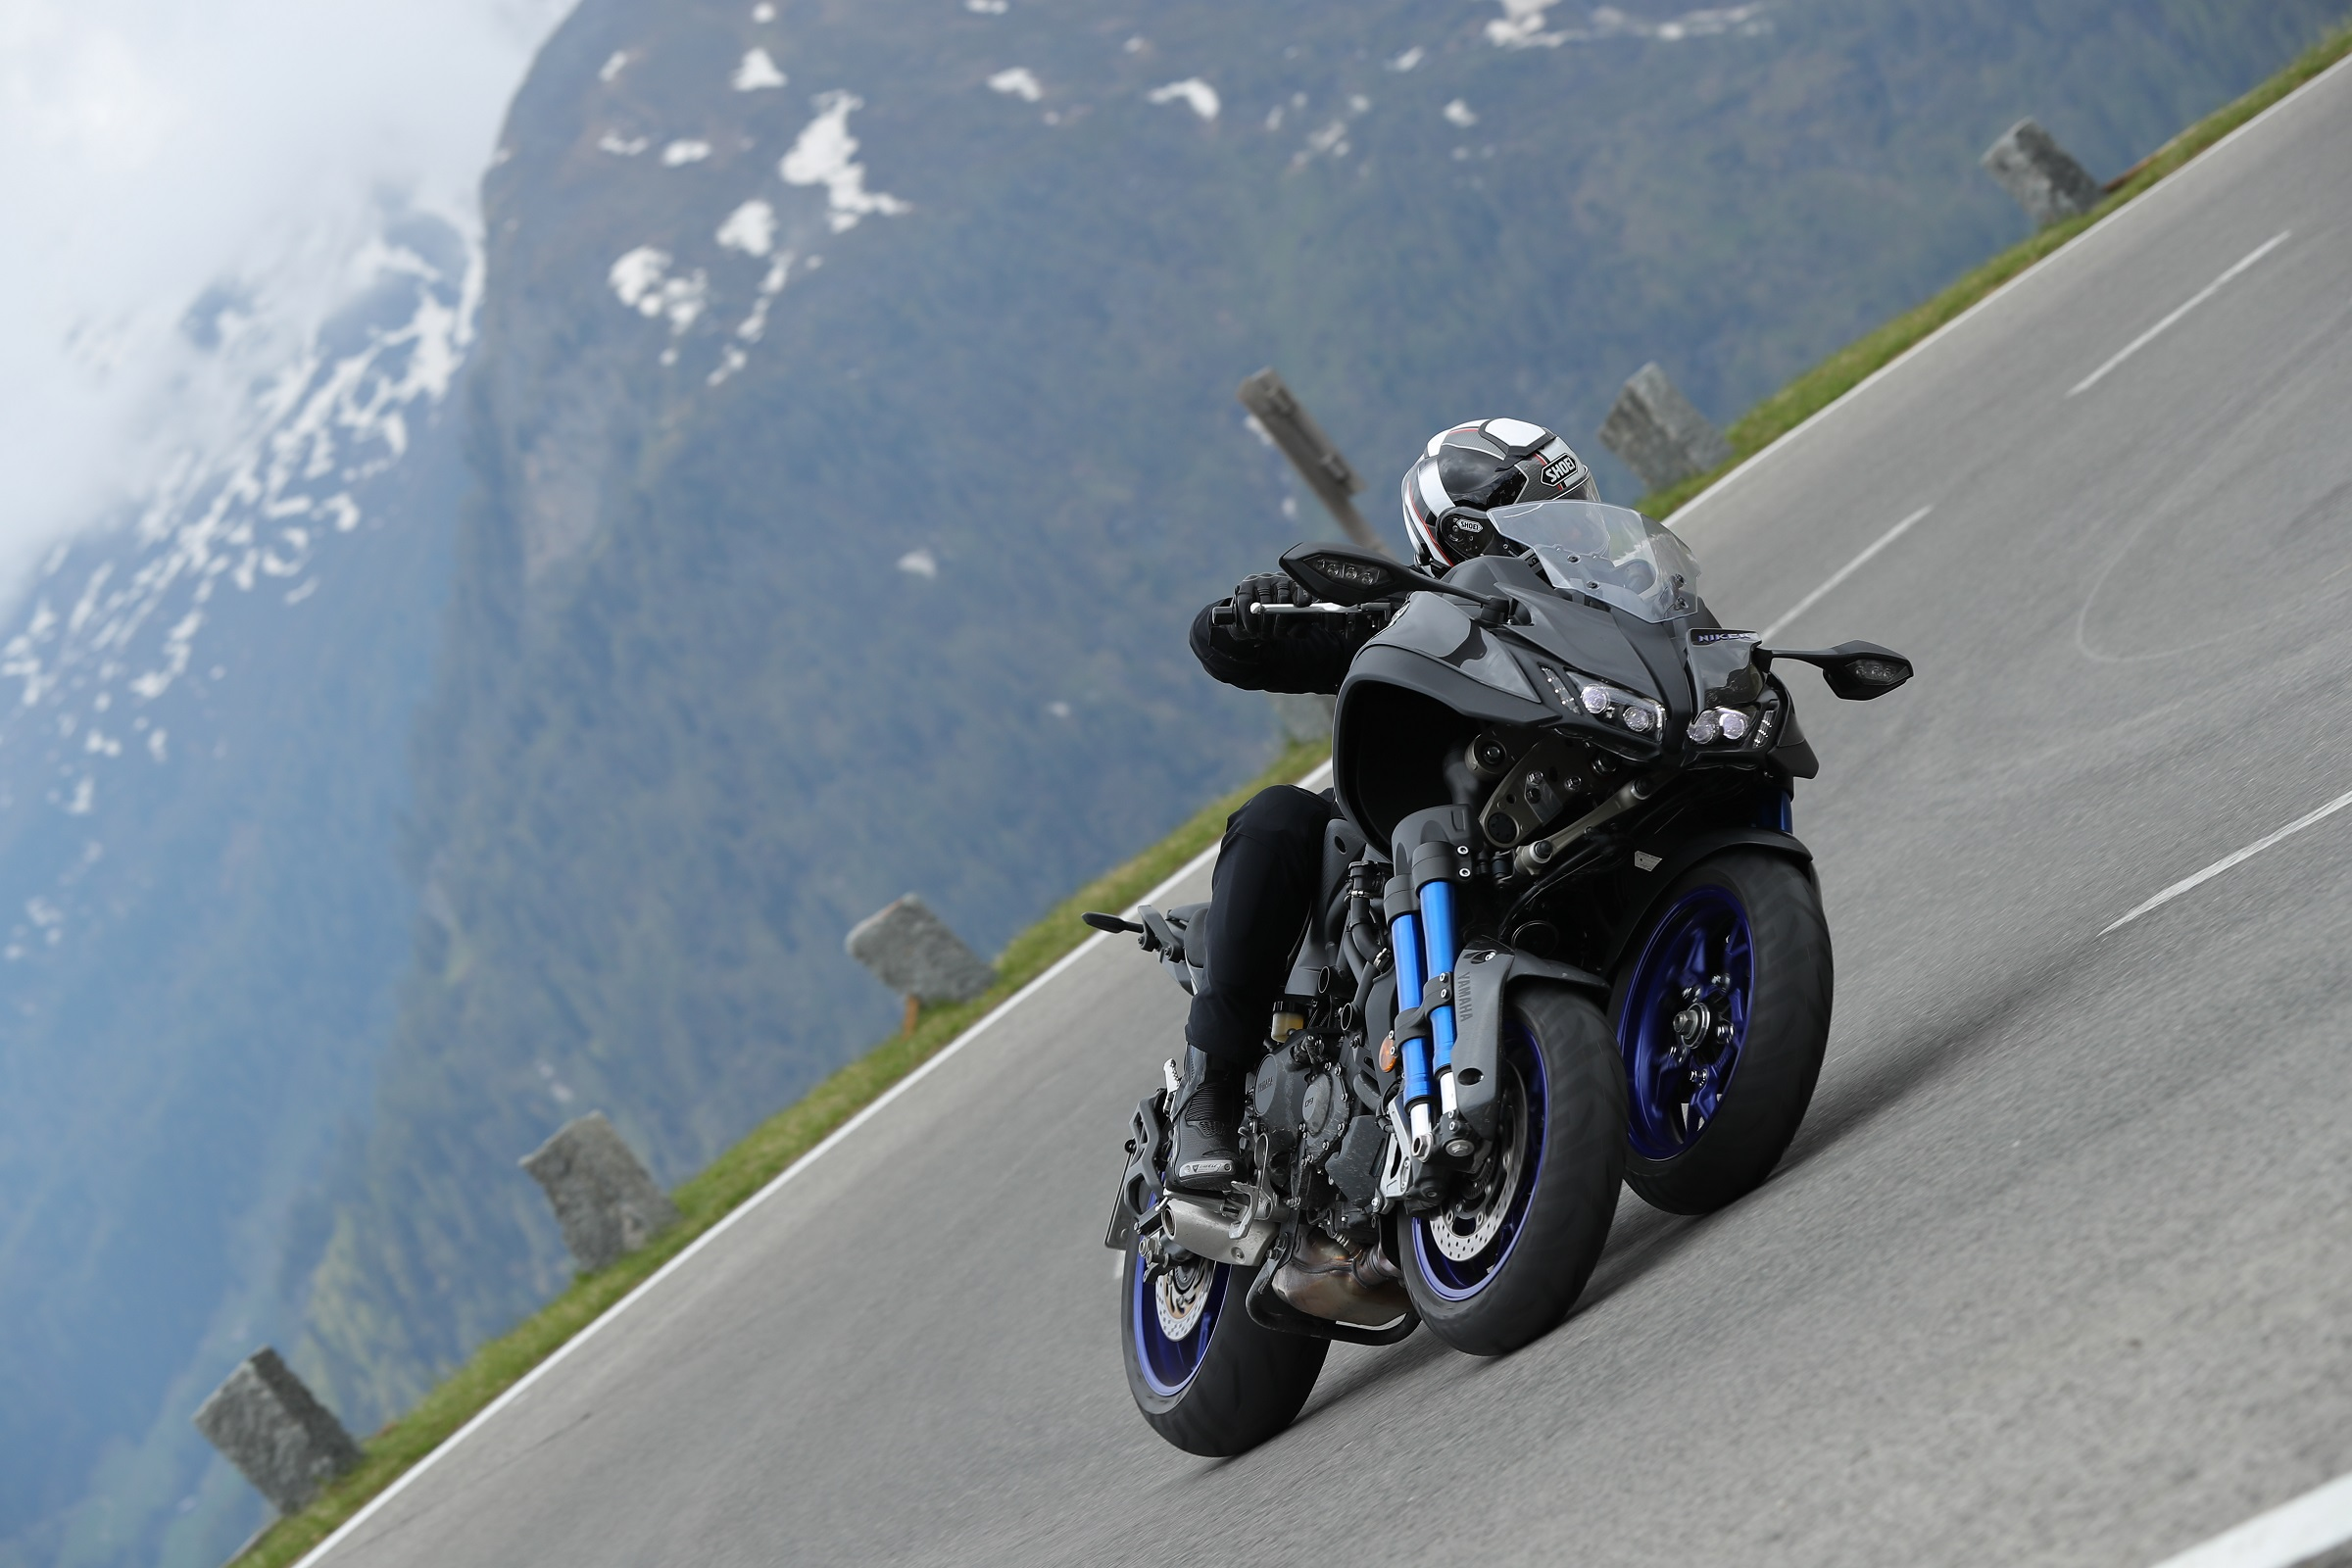 2018 Yamaha Niken First Ride Exploring The Advantages Of An Extra